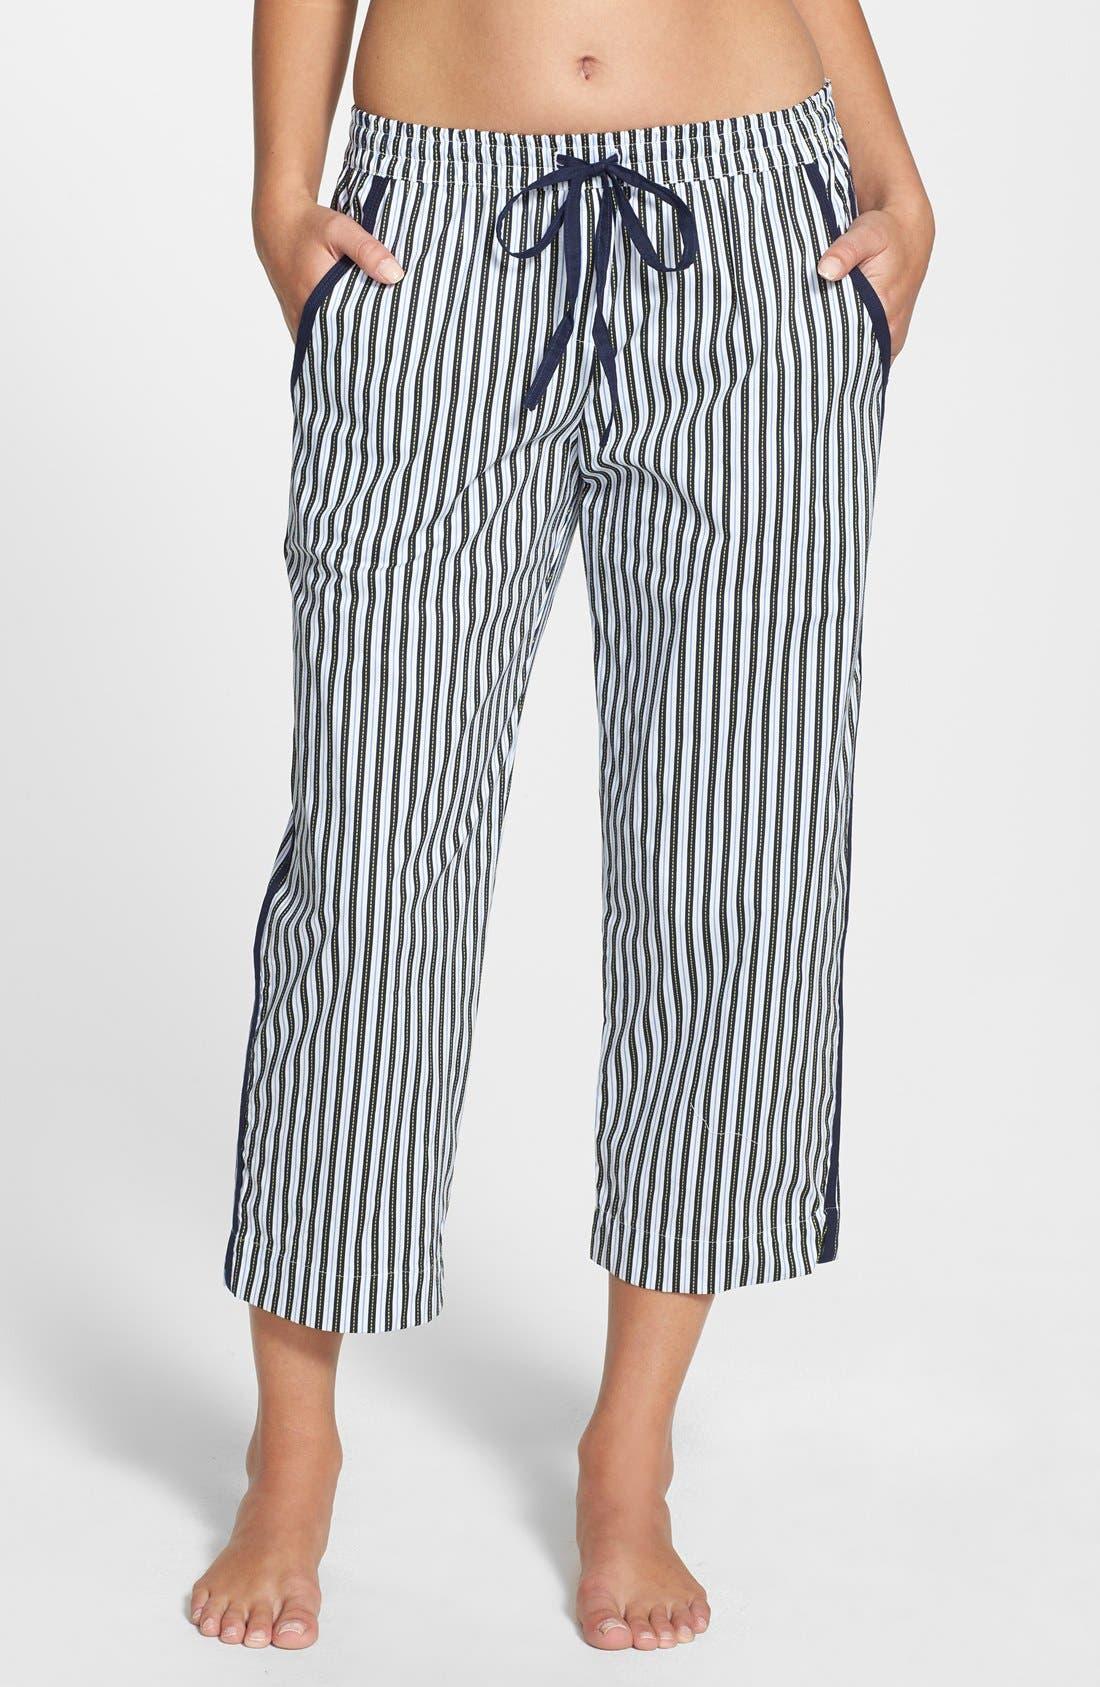 Alternate Image 1 Selected - DKNY 'Seaside Bliss' Cotton Capri Pants